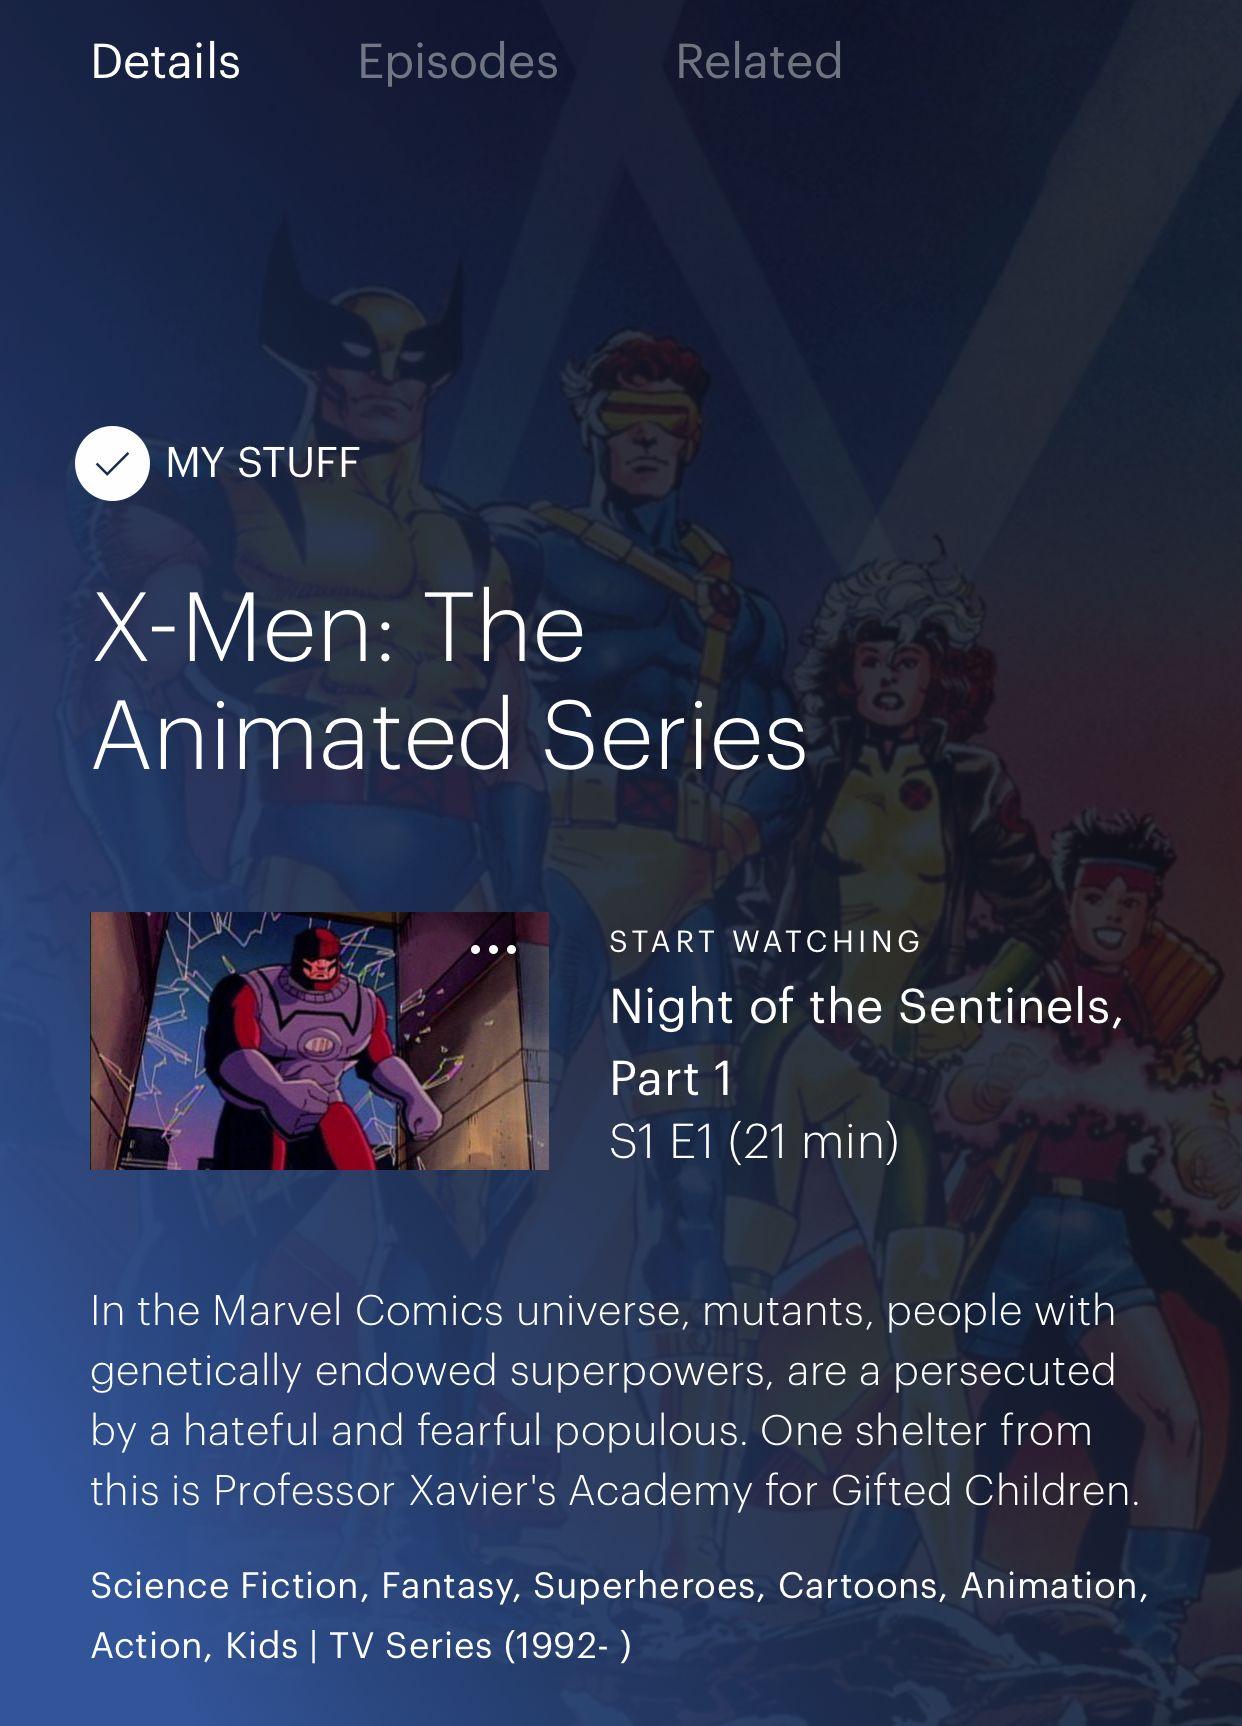 The entire Fox Kids 90s X-Men cartoon series in on Hulu